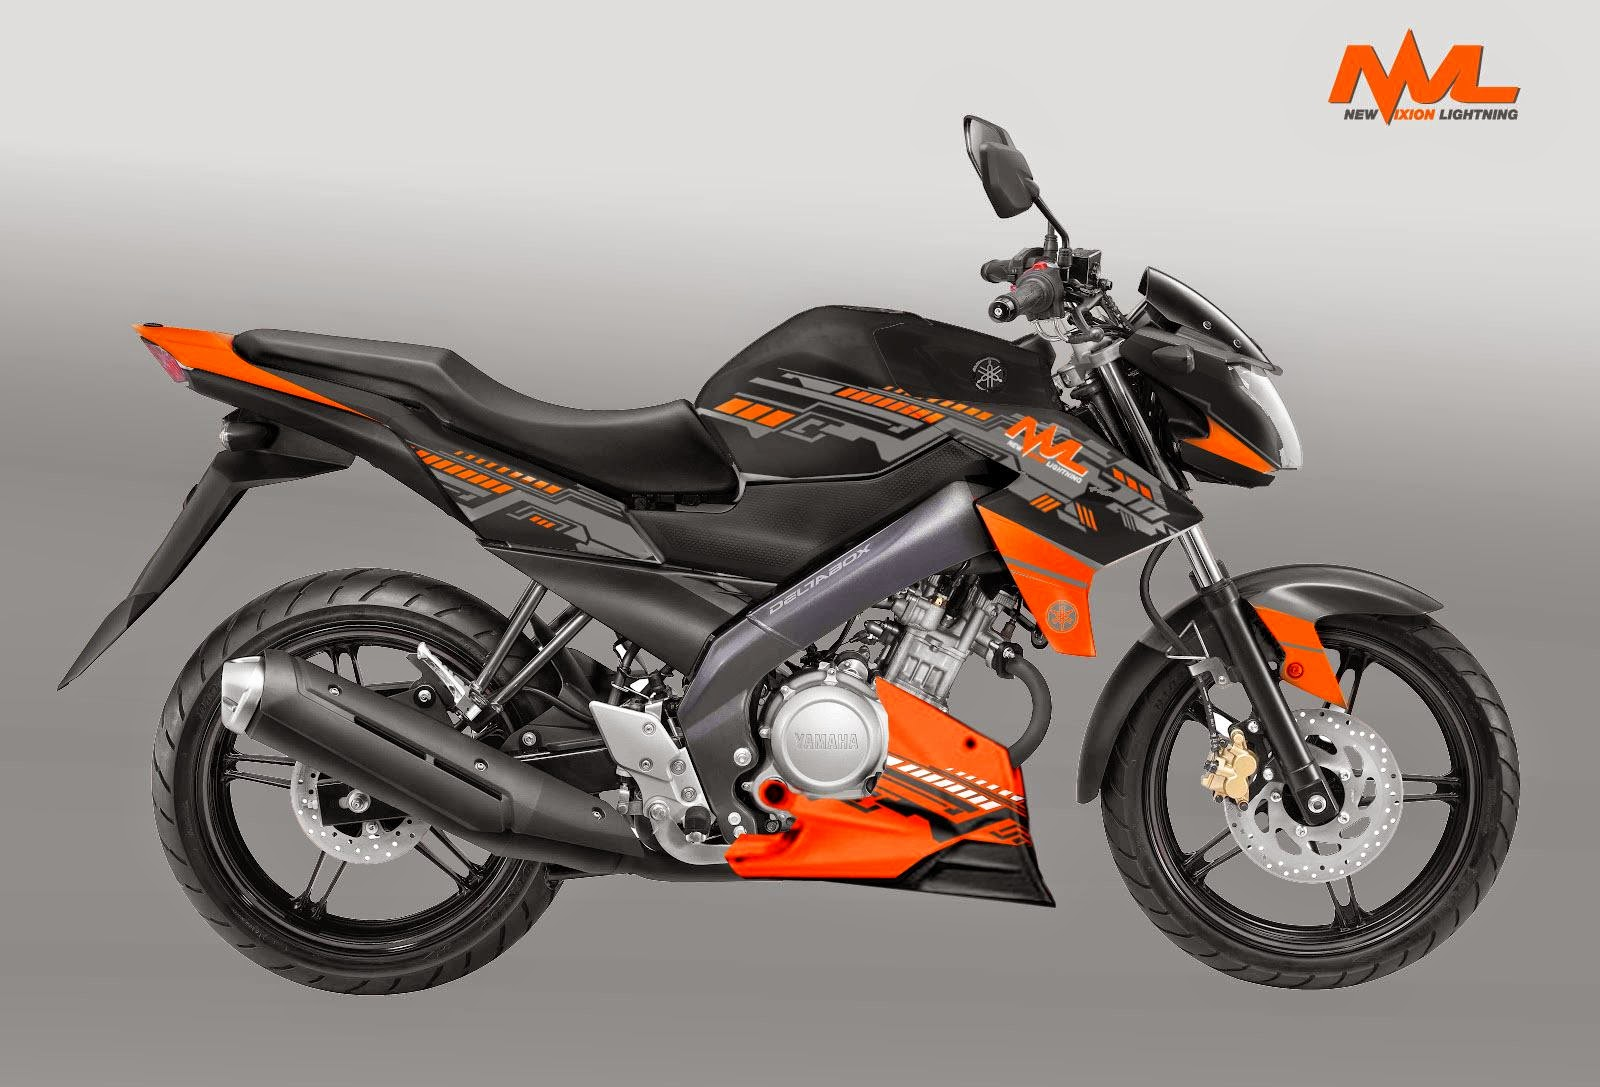 Kumpulan Modifikasi New Vixion 2014 Hitam Terlengkap Dunia Motor